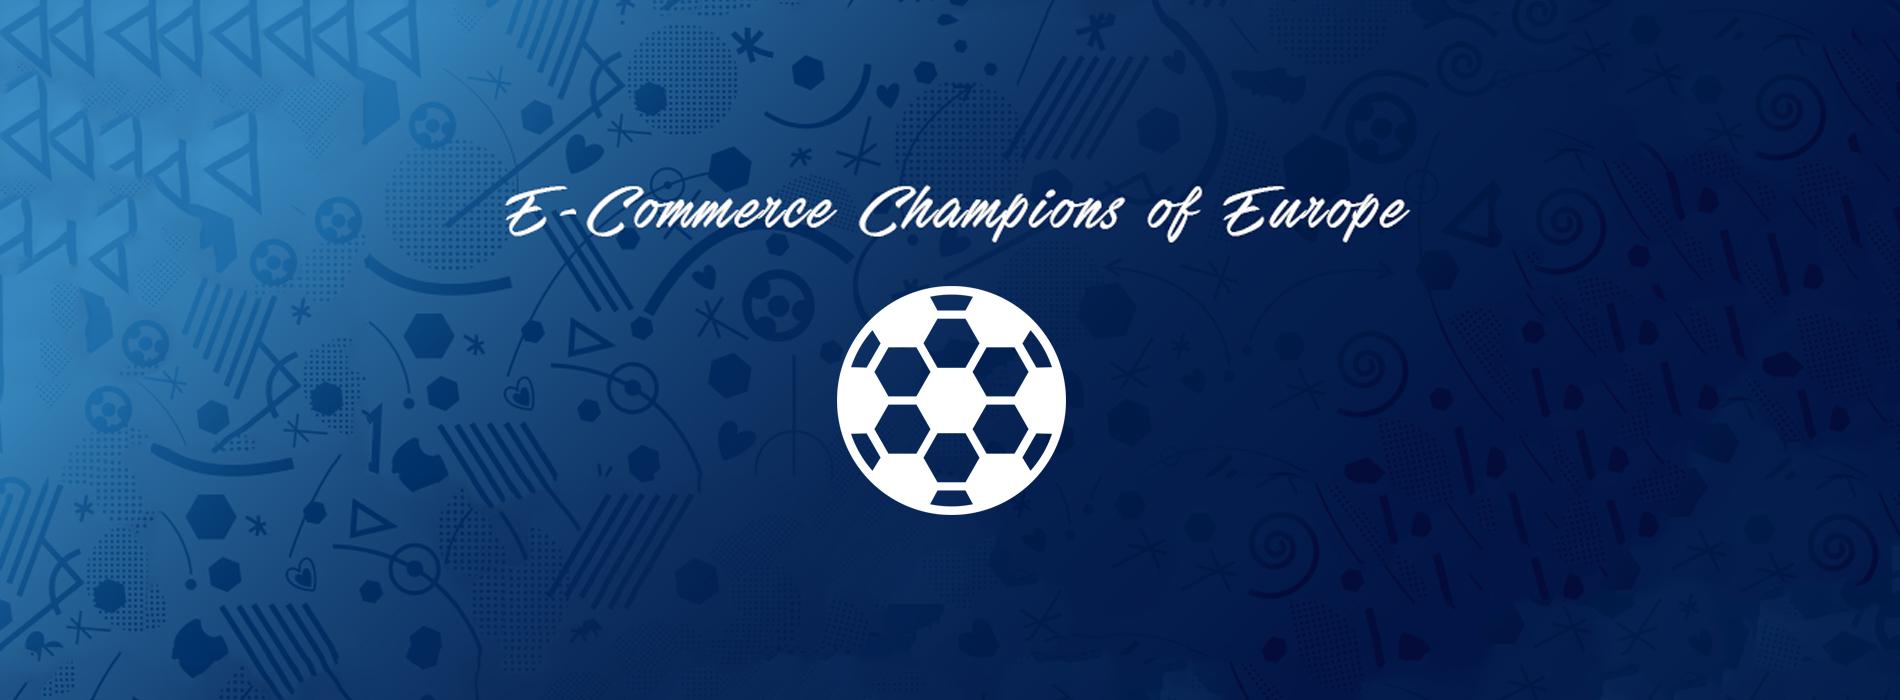 E-Commerce: Champions of Europe